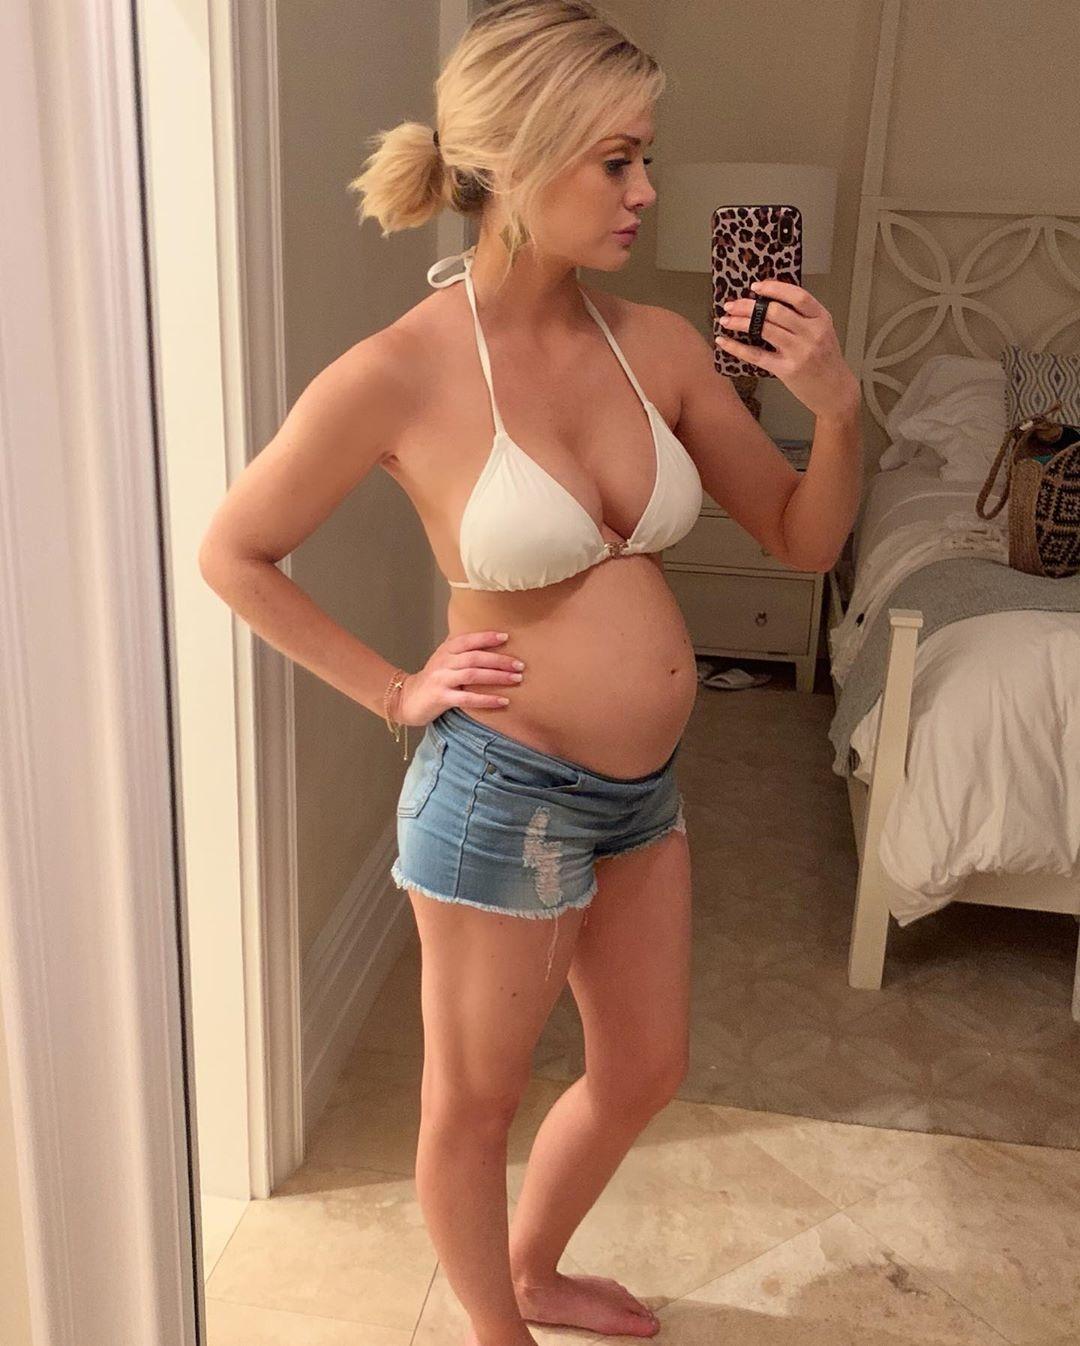 Jenna Cooper, Instagram